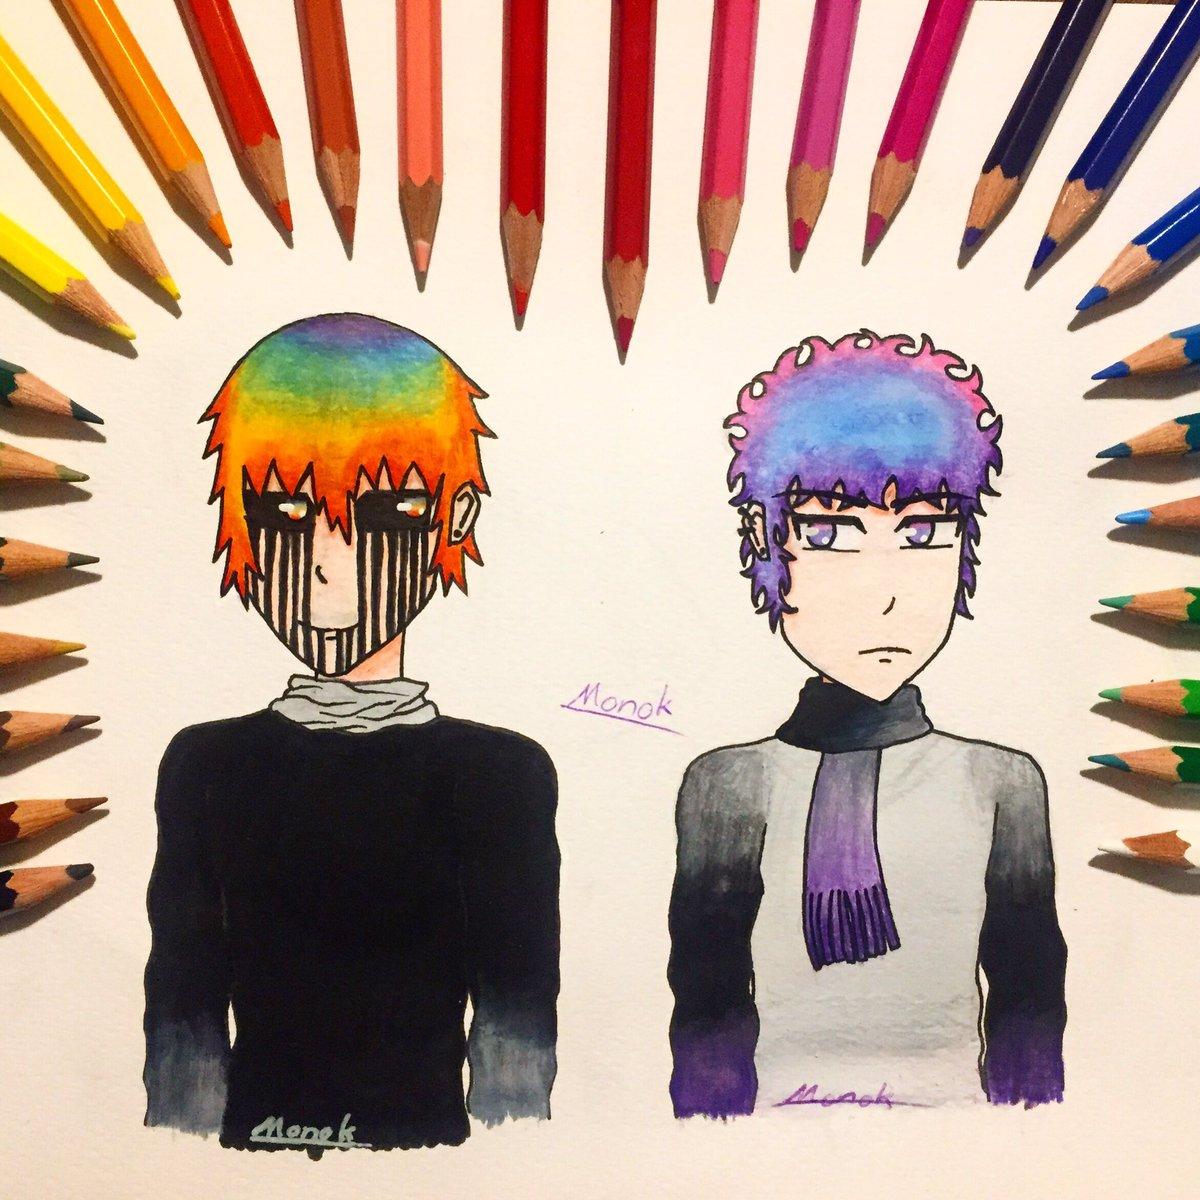 #myocs #oc #ocs #ocsart #art #artwork #myart #myartwork #pastelxrainbow #pastel #rainbow #instaart #instaartwork #watercolorpencils #myartstyle #mystylepic.twitter.com/Tg5UmruRee